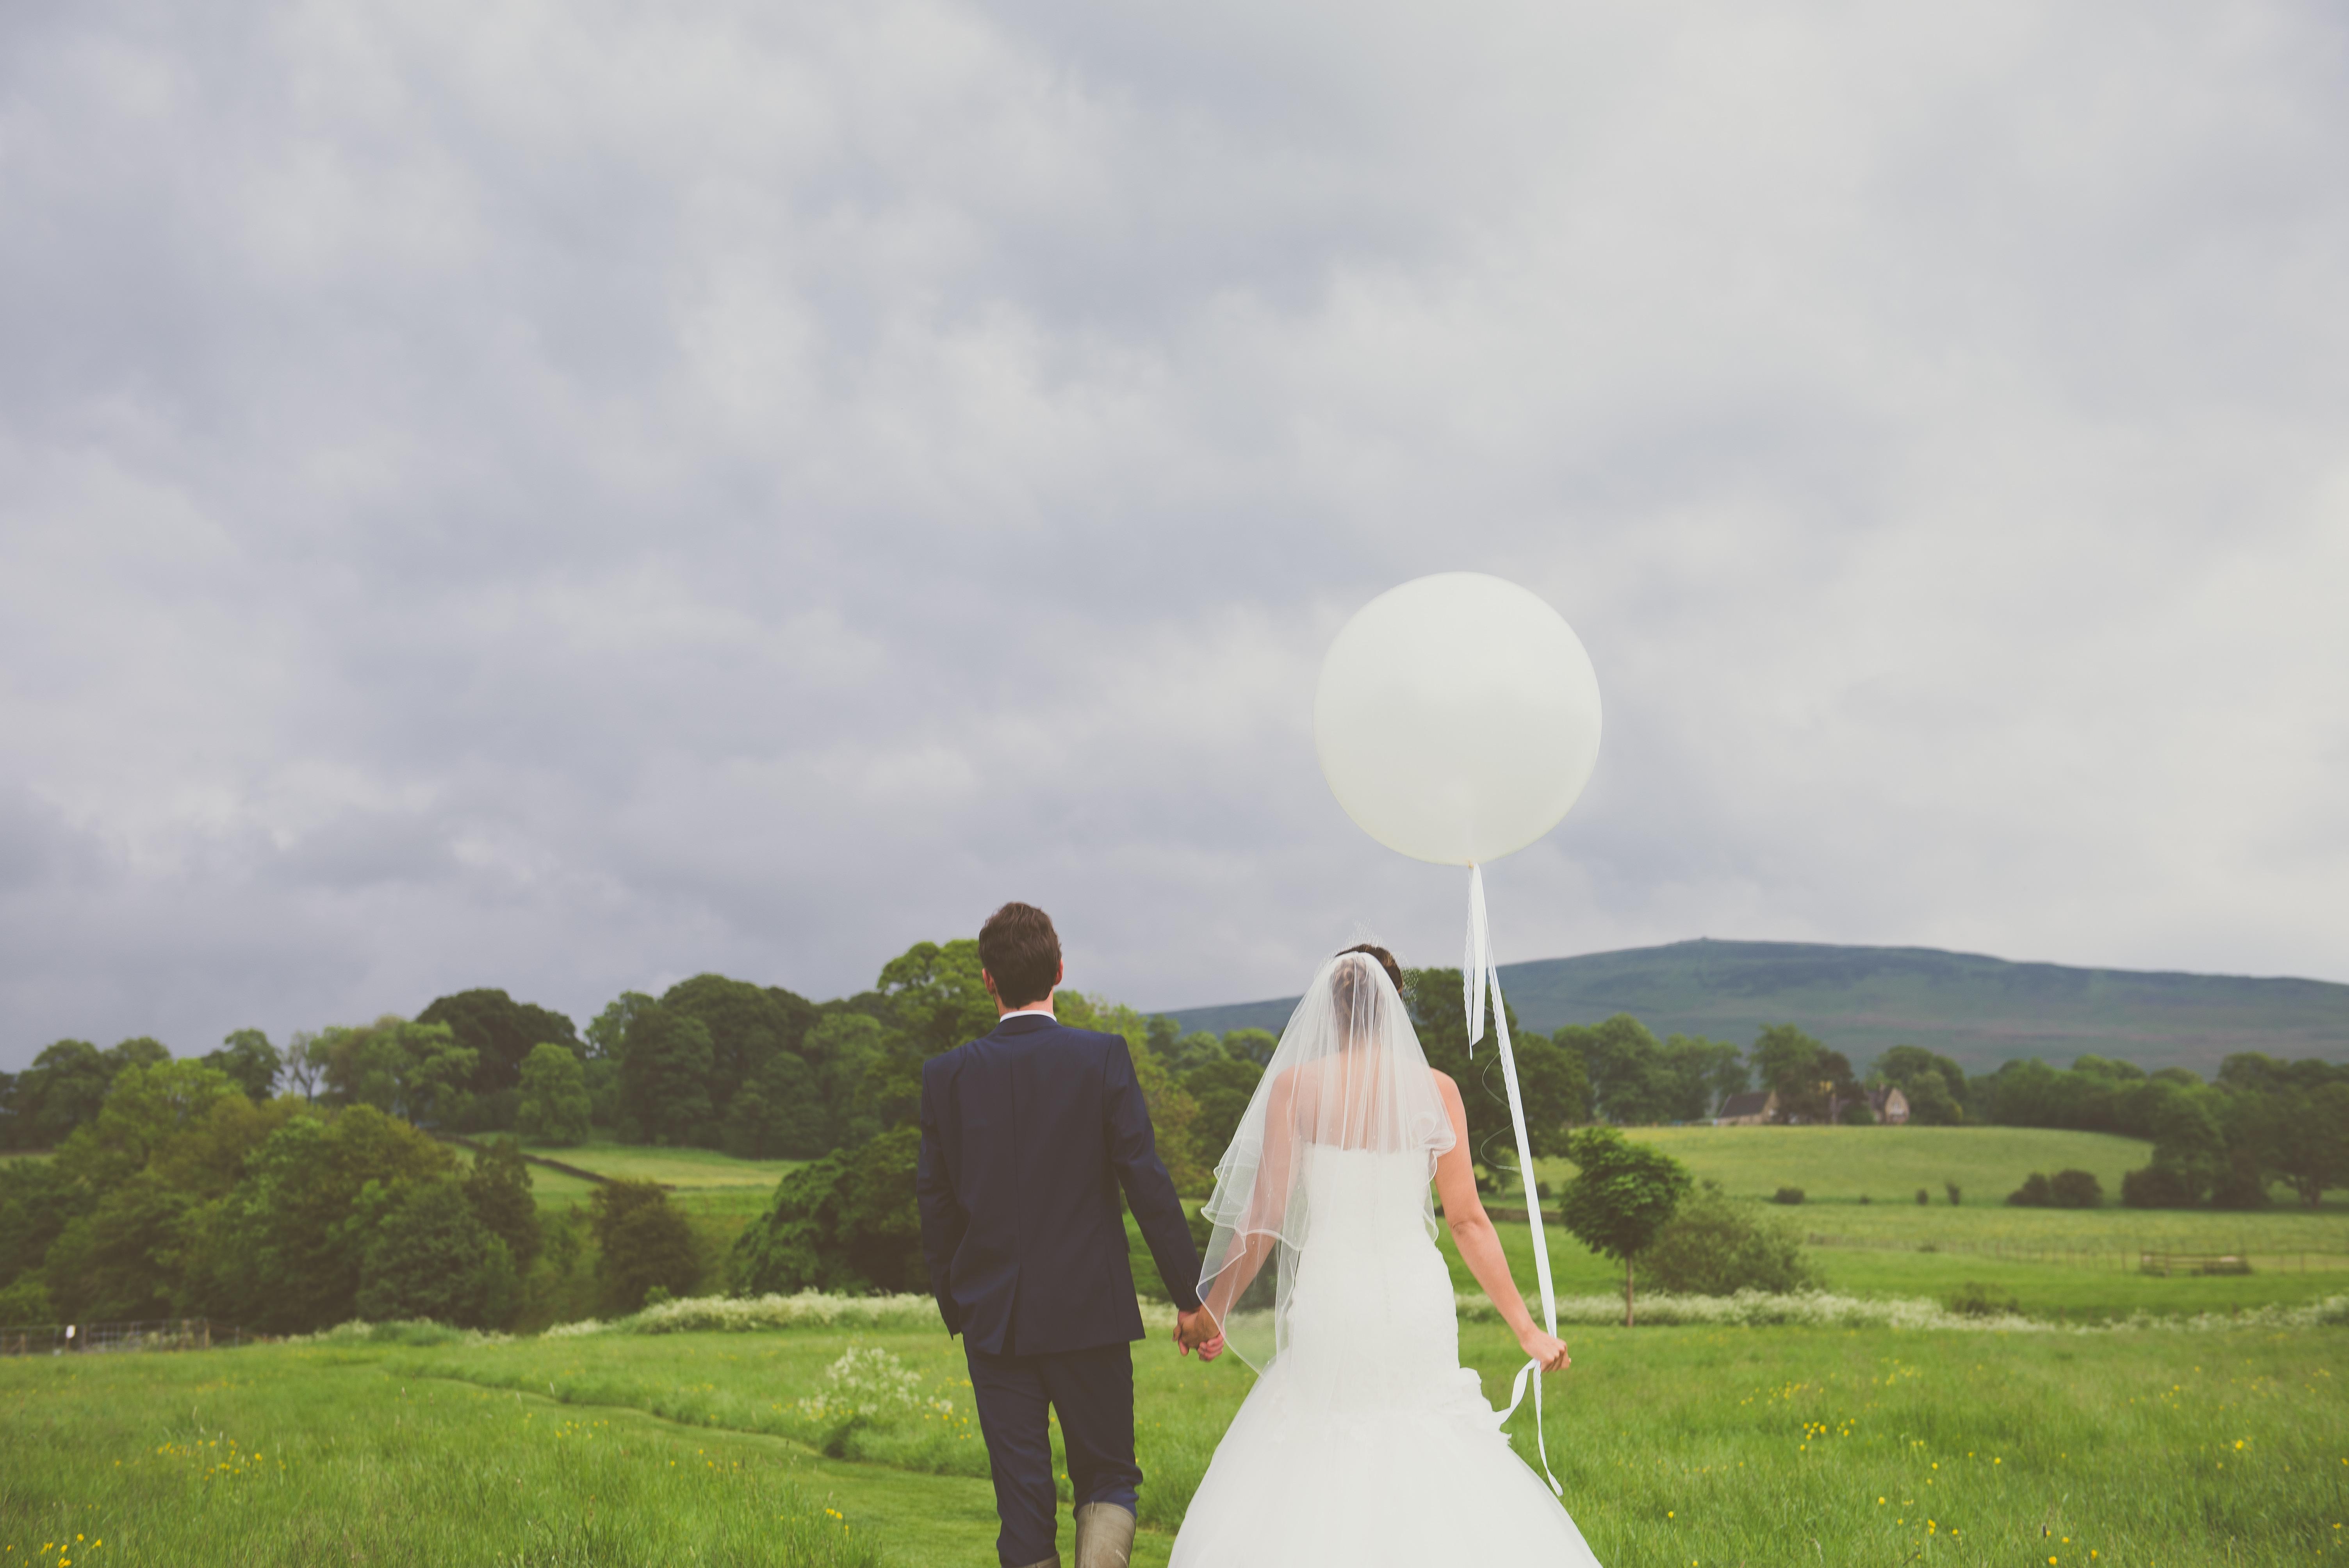 Yorkshire Wedding Planner, Luxury Yorkshire Wedding Venue, Big Round Balloon, Photography Prop